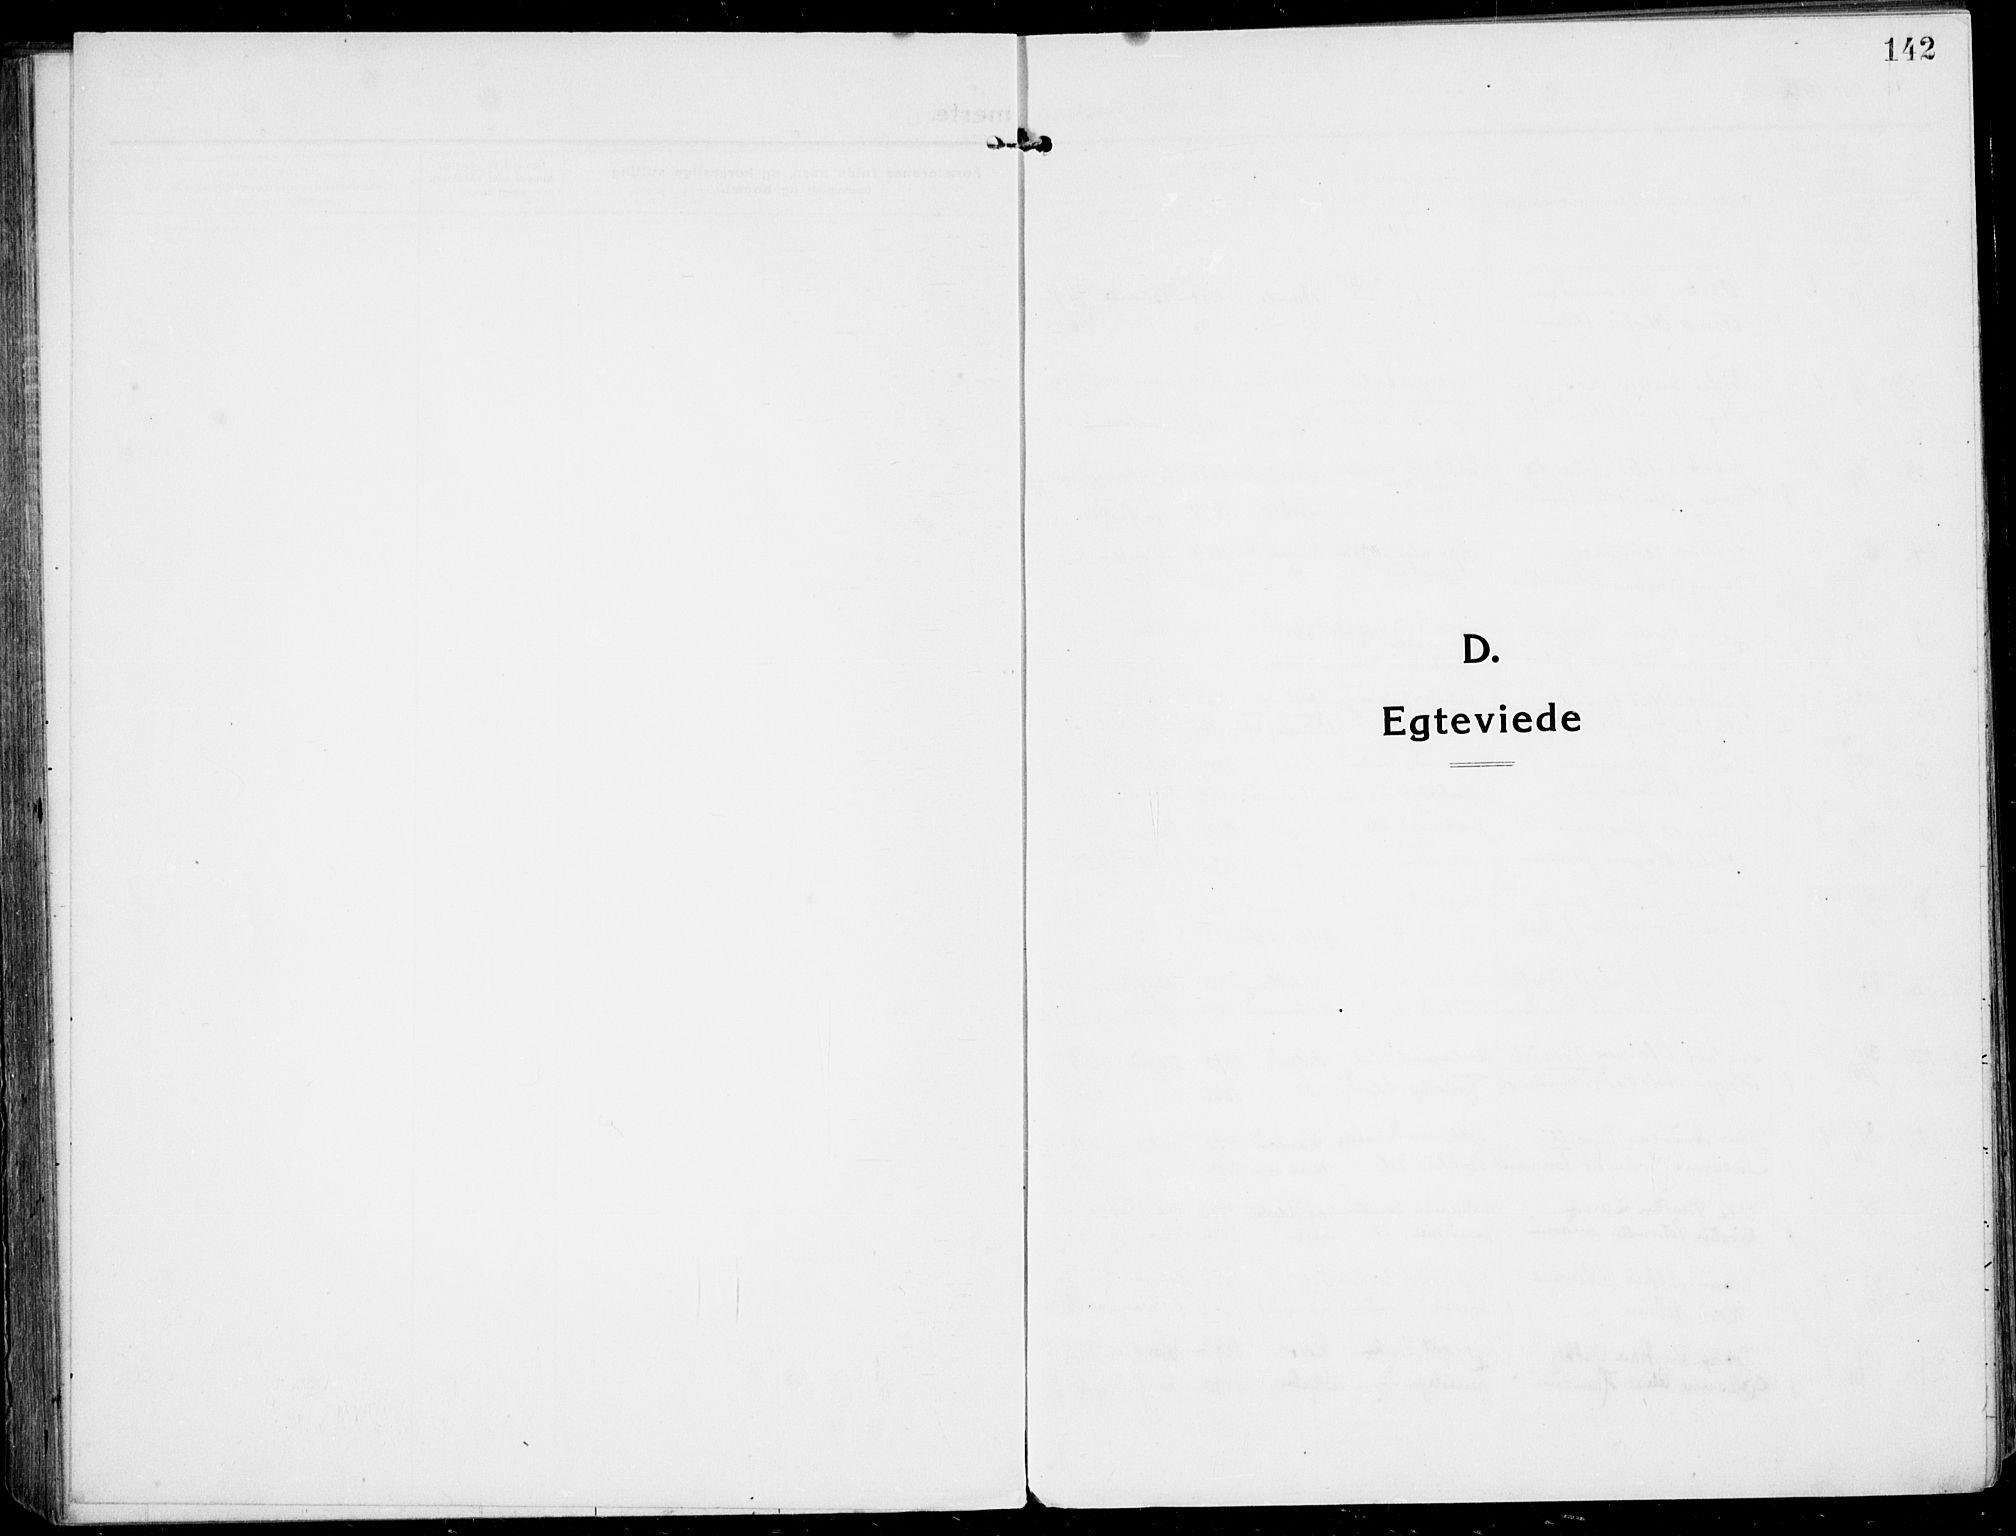 SAKO, Rjukan kirkebøker, F/Fa/L0002: Ministerialbok nr. 2, 1912-1917, s. 142